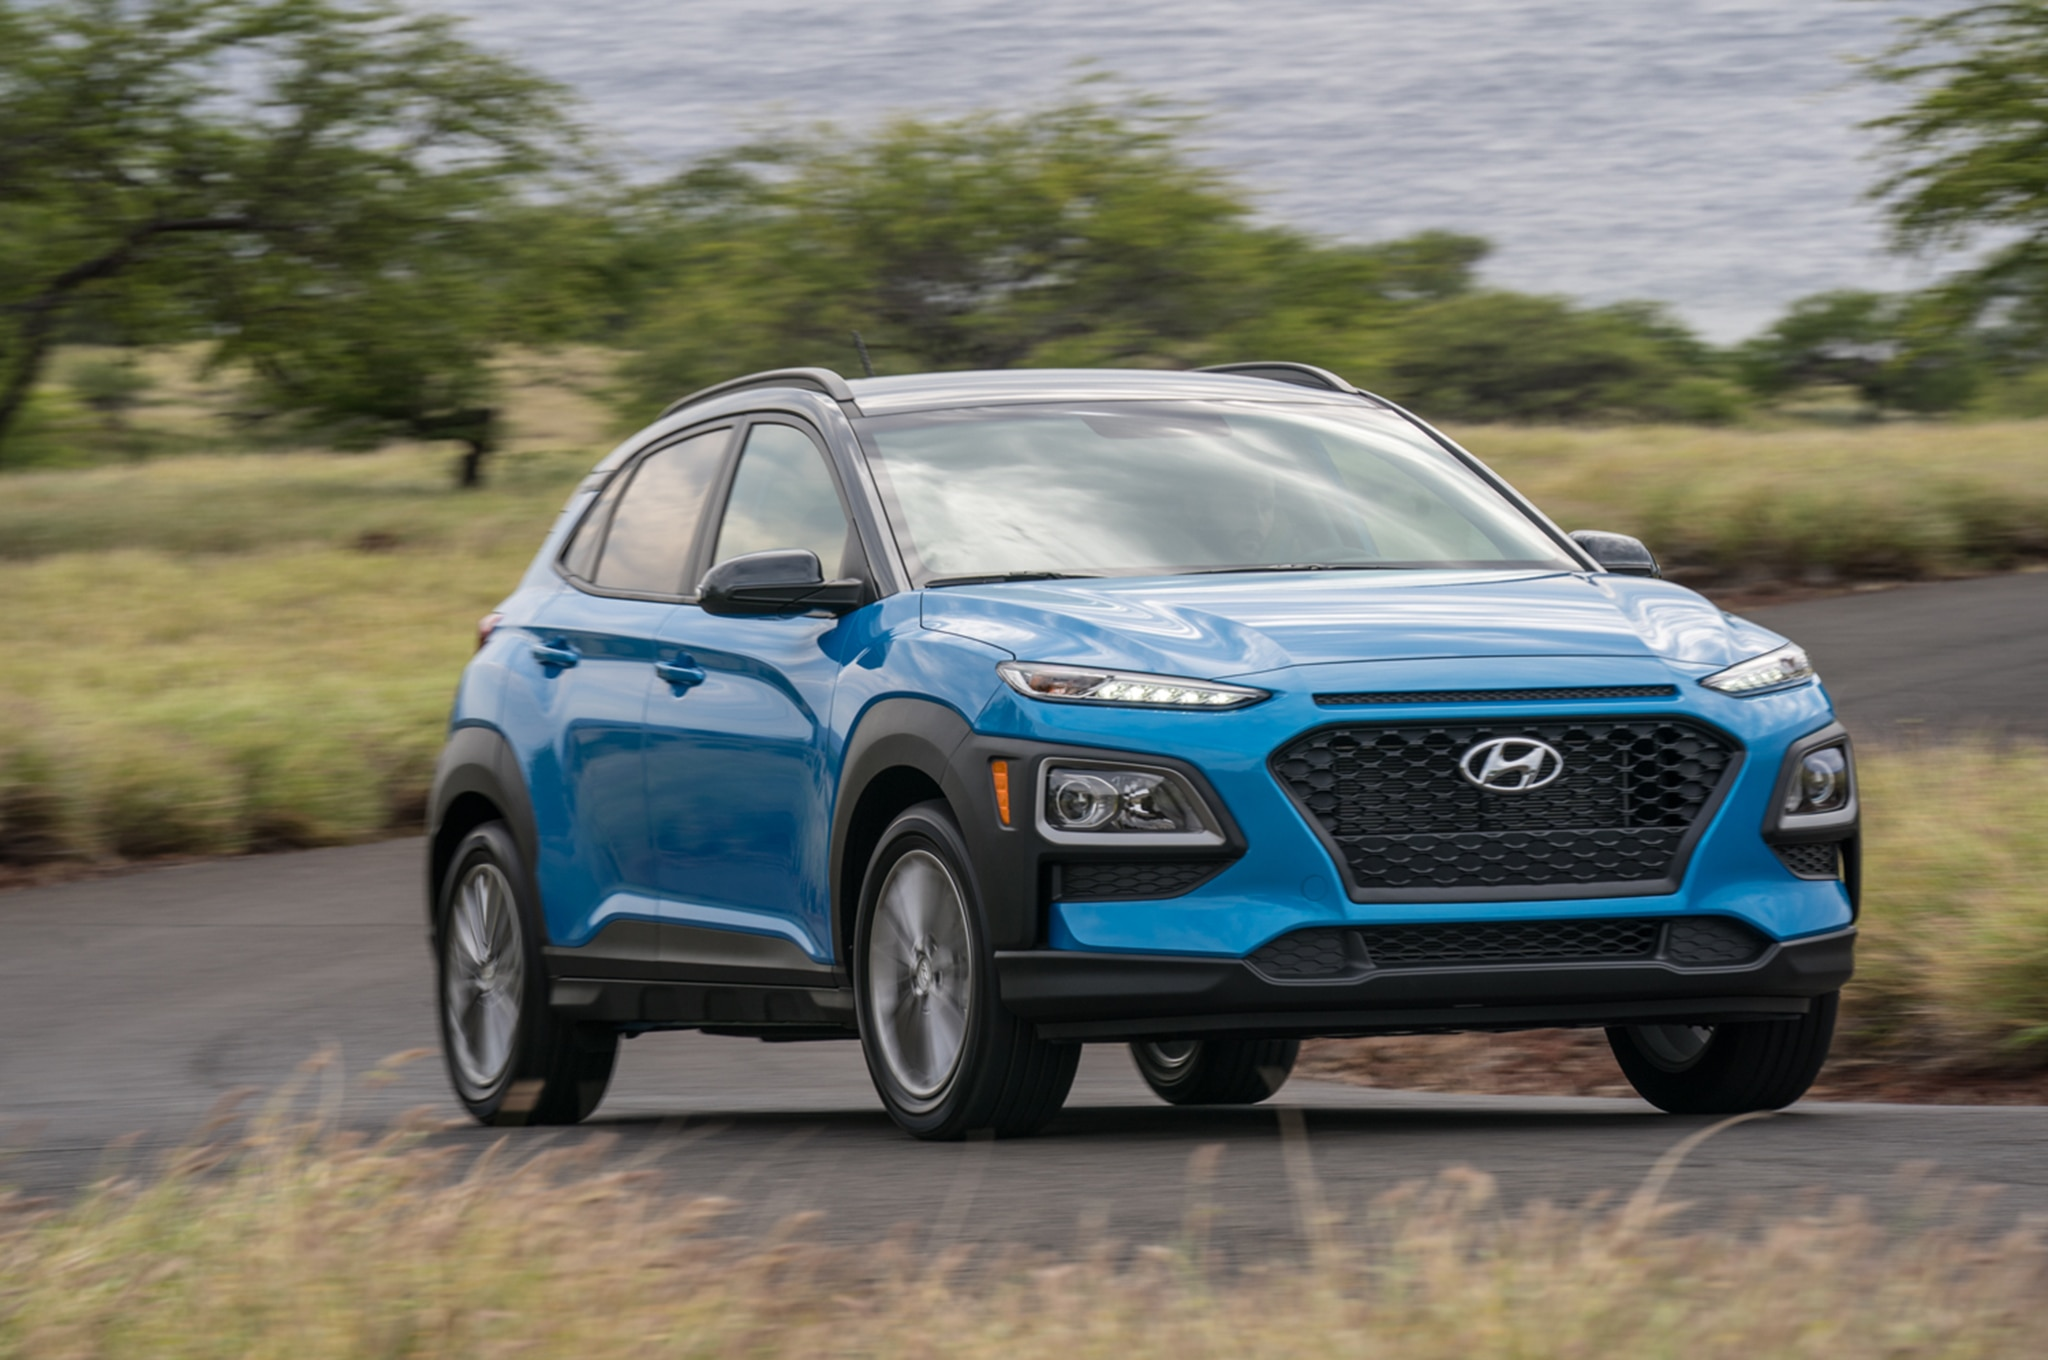 2018 Hyundai Kona Front Three Quarter In Motion 6